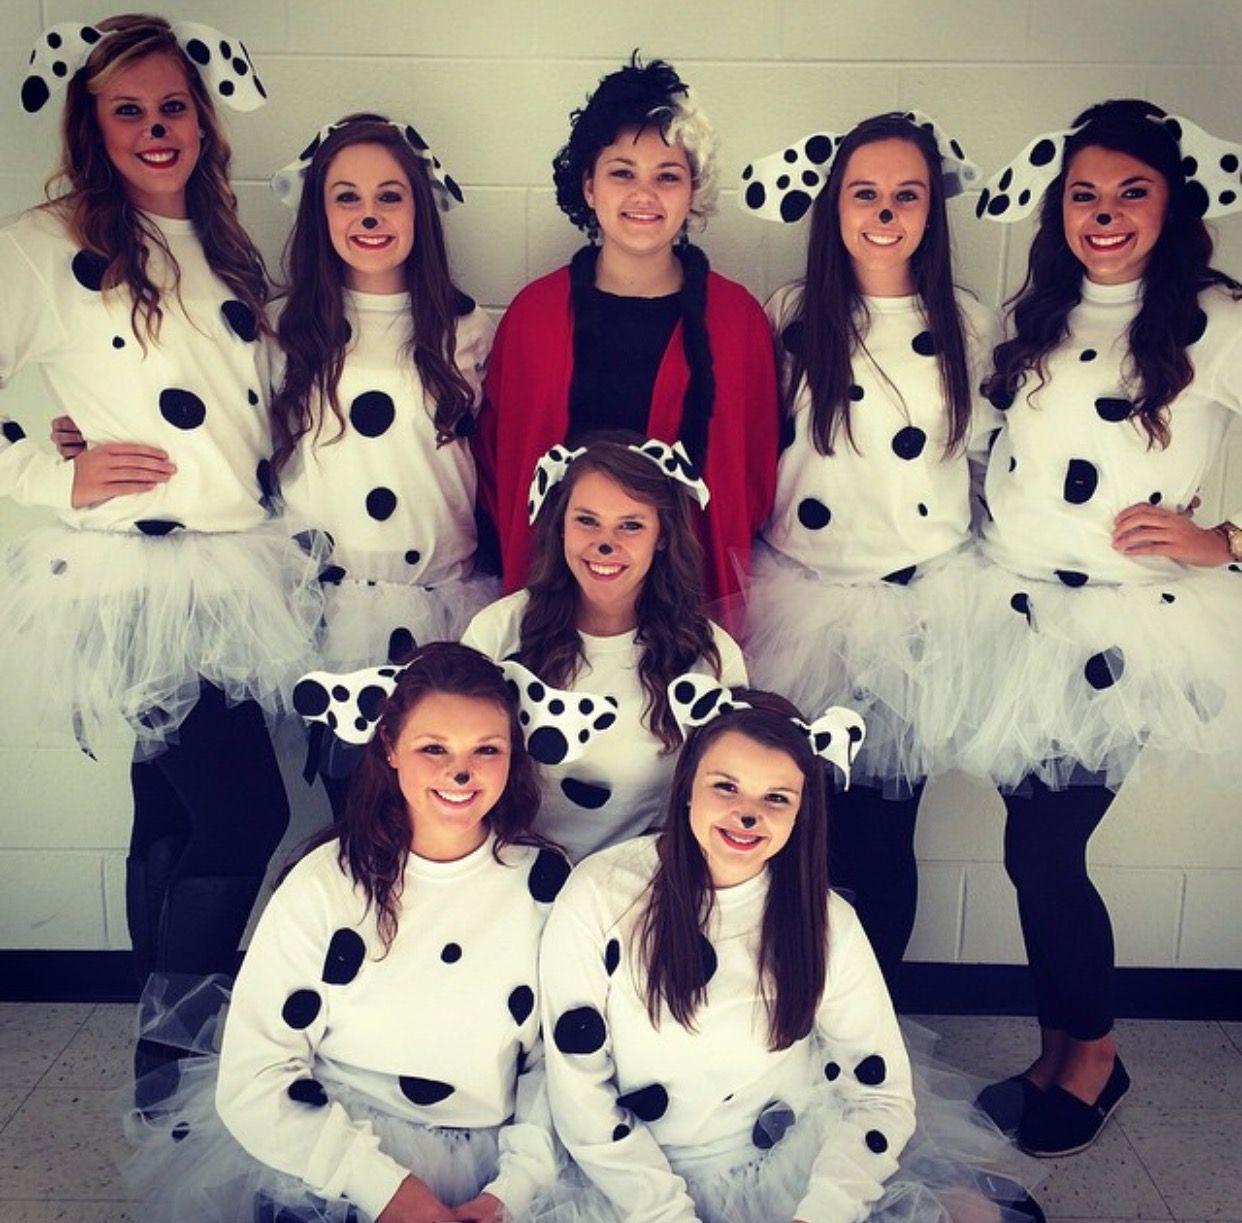 Diy 101 Dalmatians Spirit Week Halloween Costume #spiritweek #costume Pins In 2019